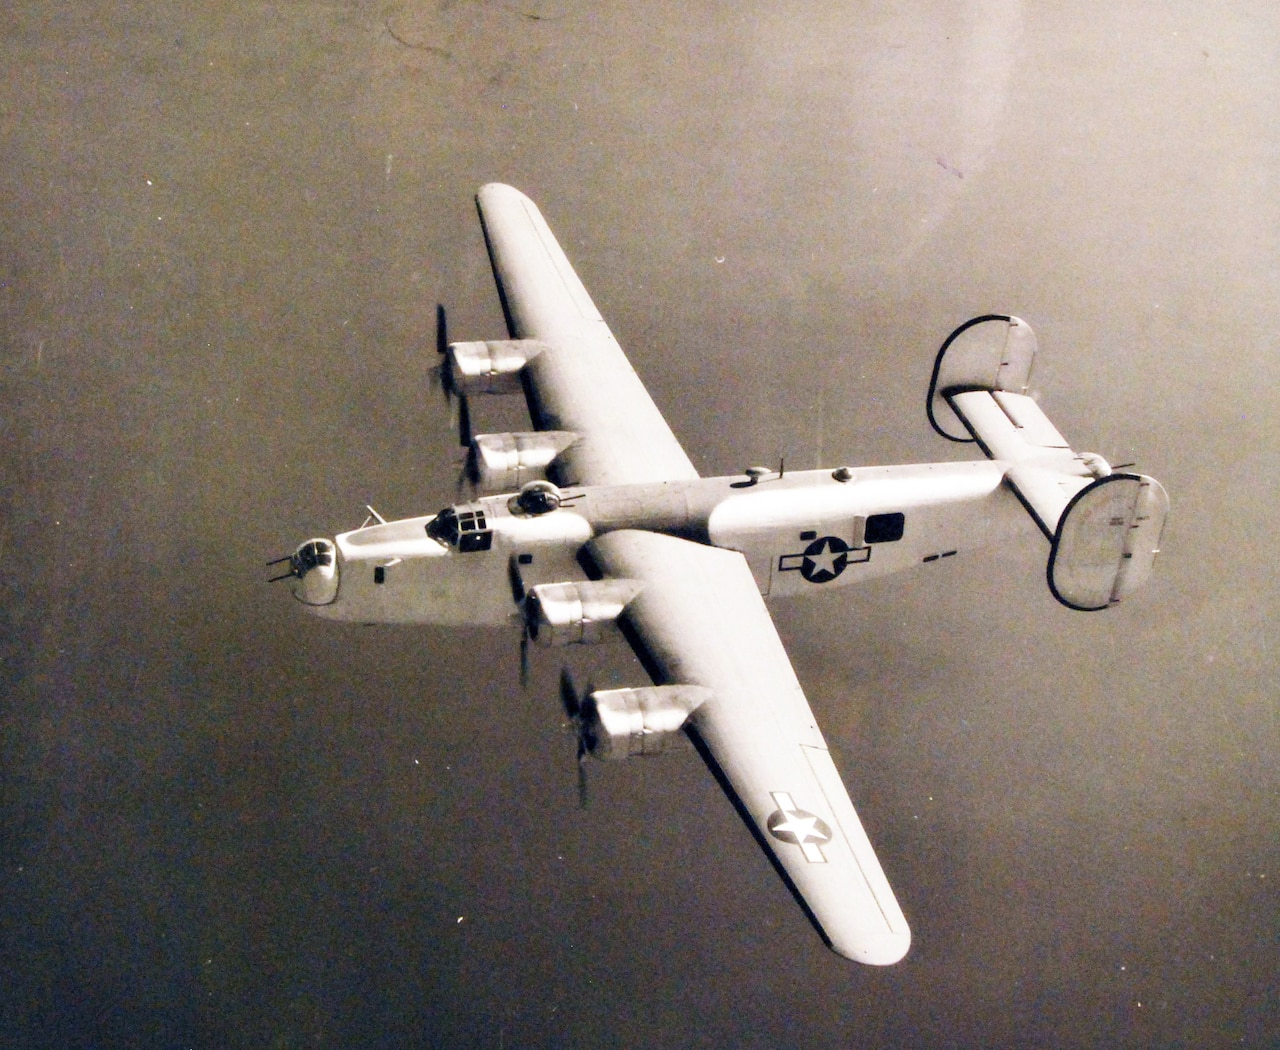 A four-propeller airplane flies in the air.